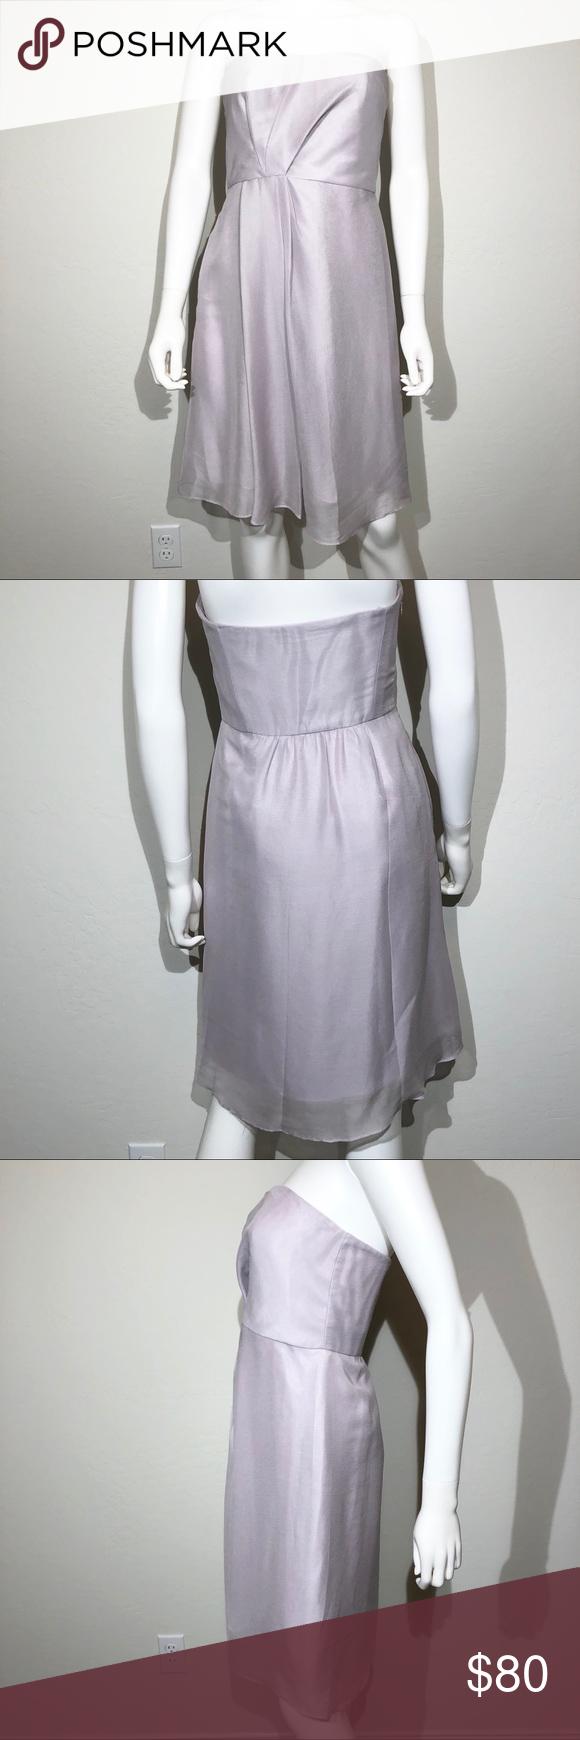 J Crew Prom Dress Size 4 Purple Strapless Silk NWT | Pinterest